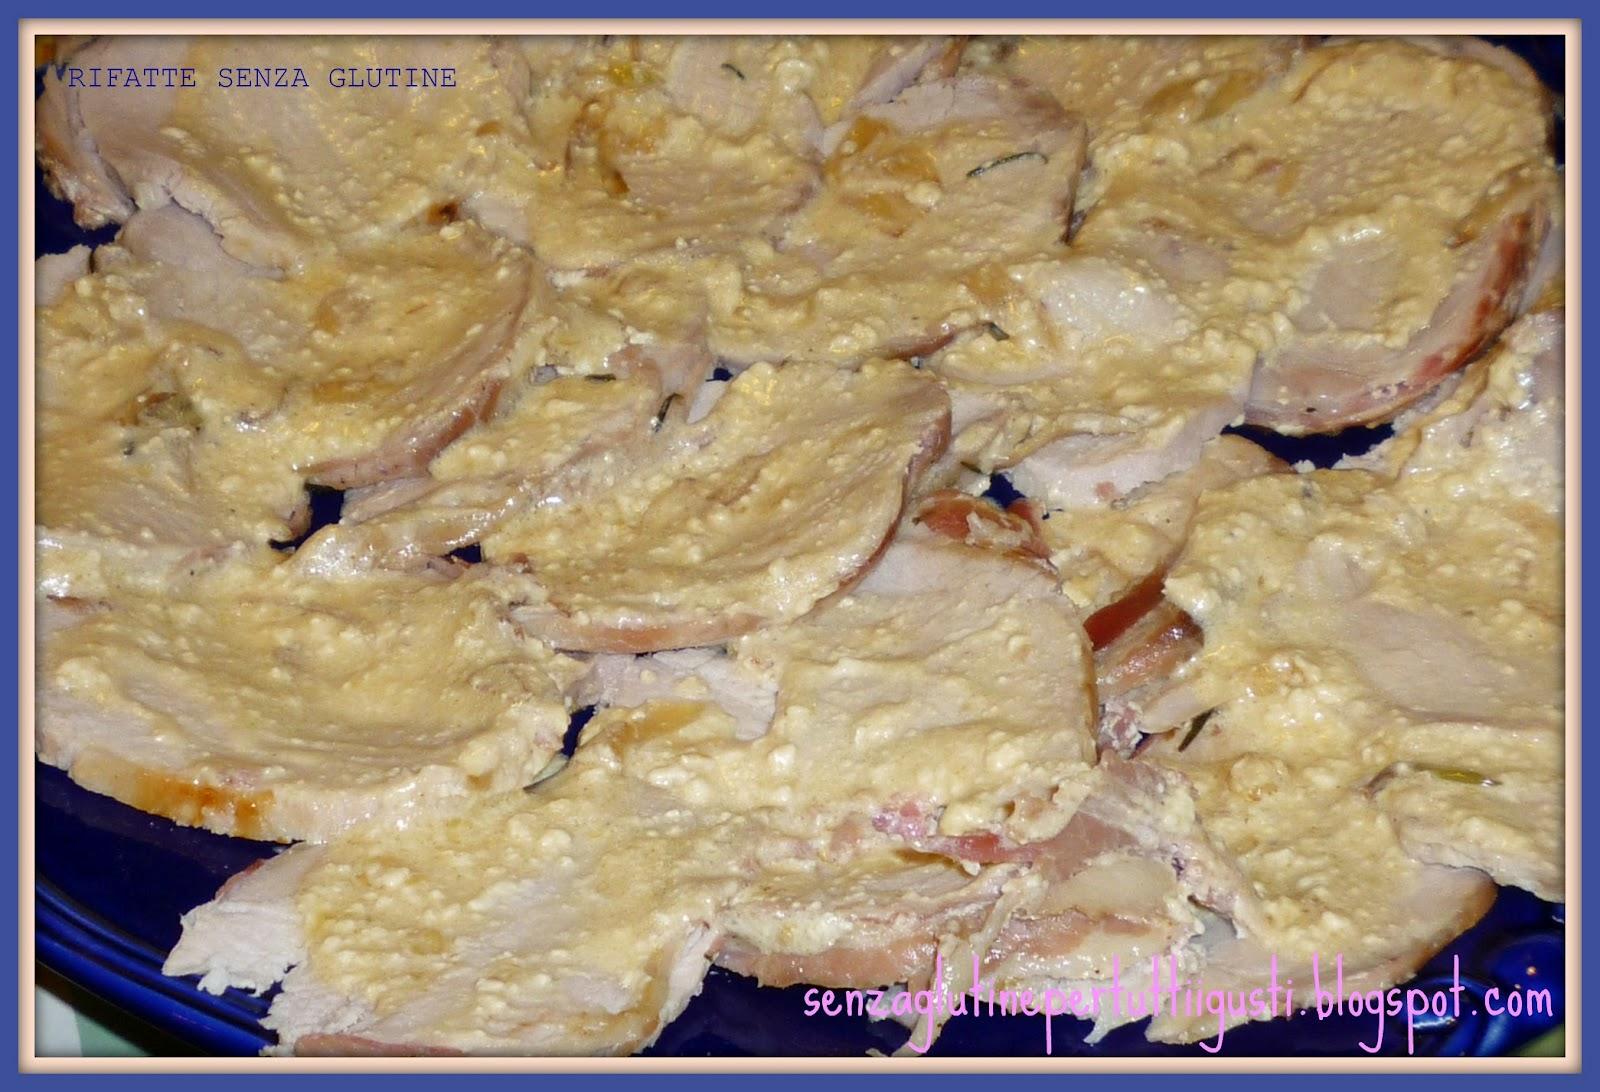 Senza Glutine Per Tutti I Gusti!: RIFATTE SENZA GLUTINE: Arrosto  #0F0B2C 1600 1092 Cucina Mediterranea Senza Glutine Pdf